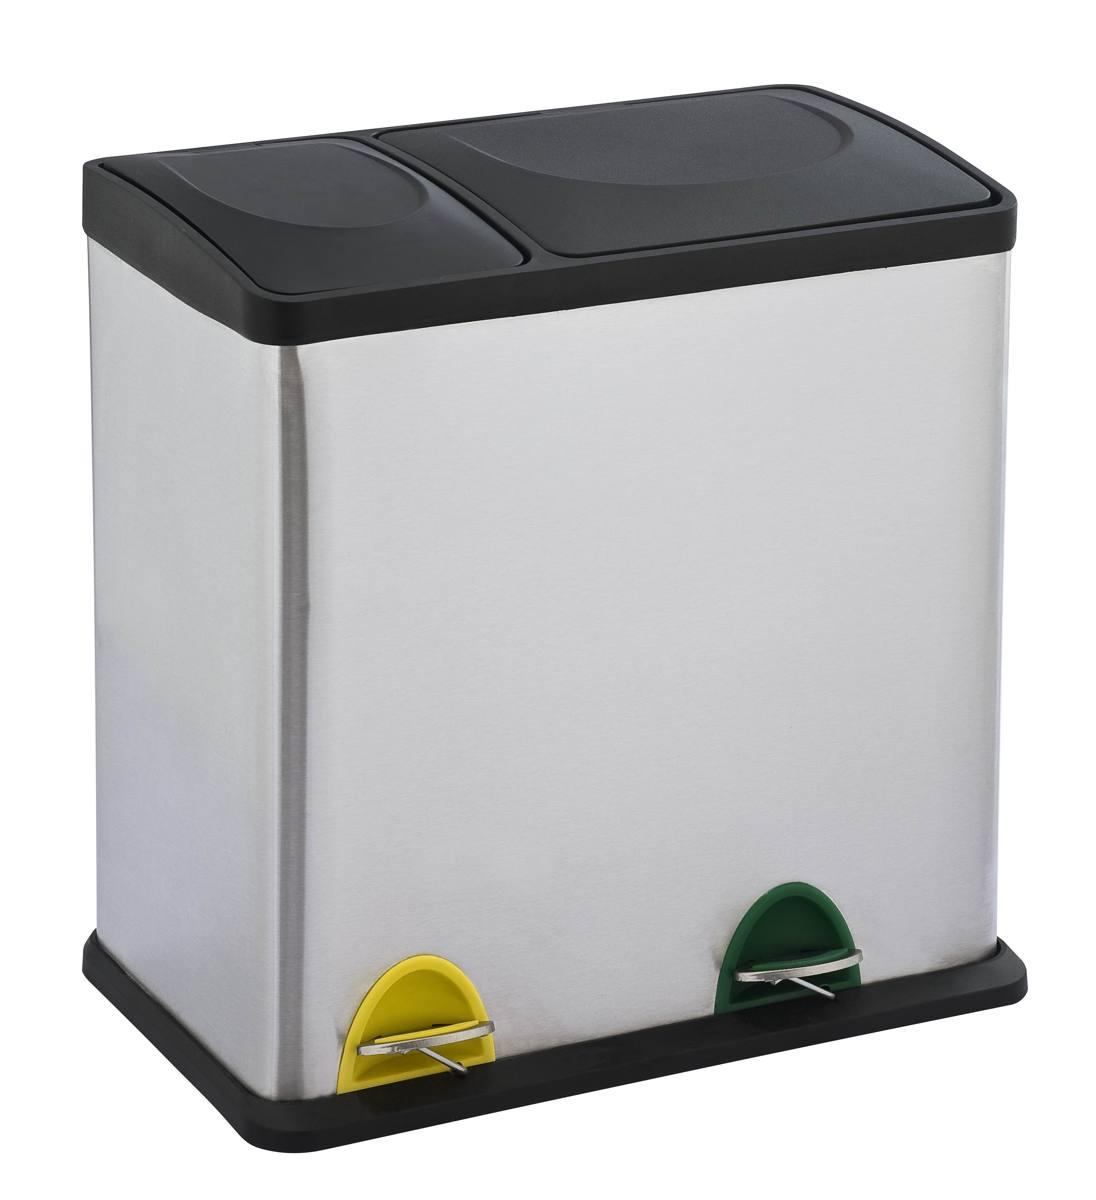 Bekend bol.com | Afvalscheidingprullenbak kopen? Kijk snel! AQ38